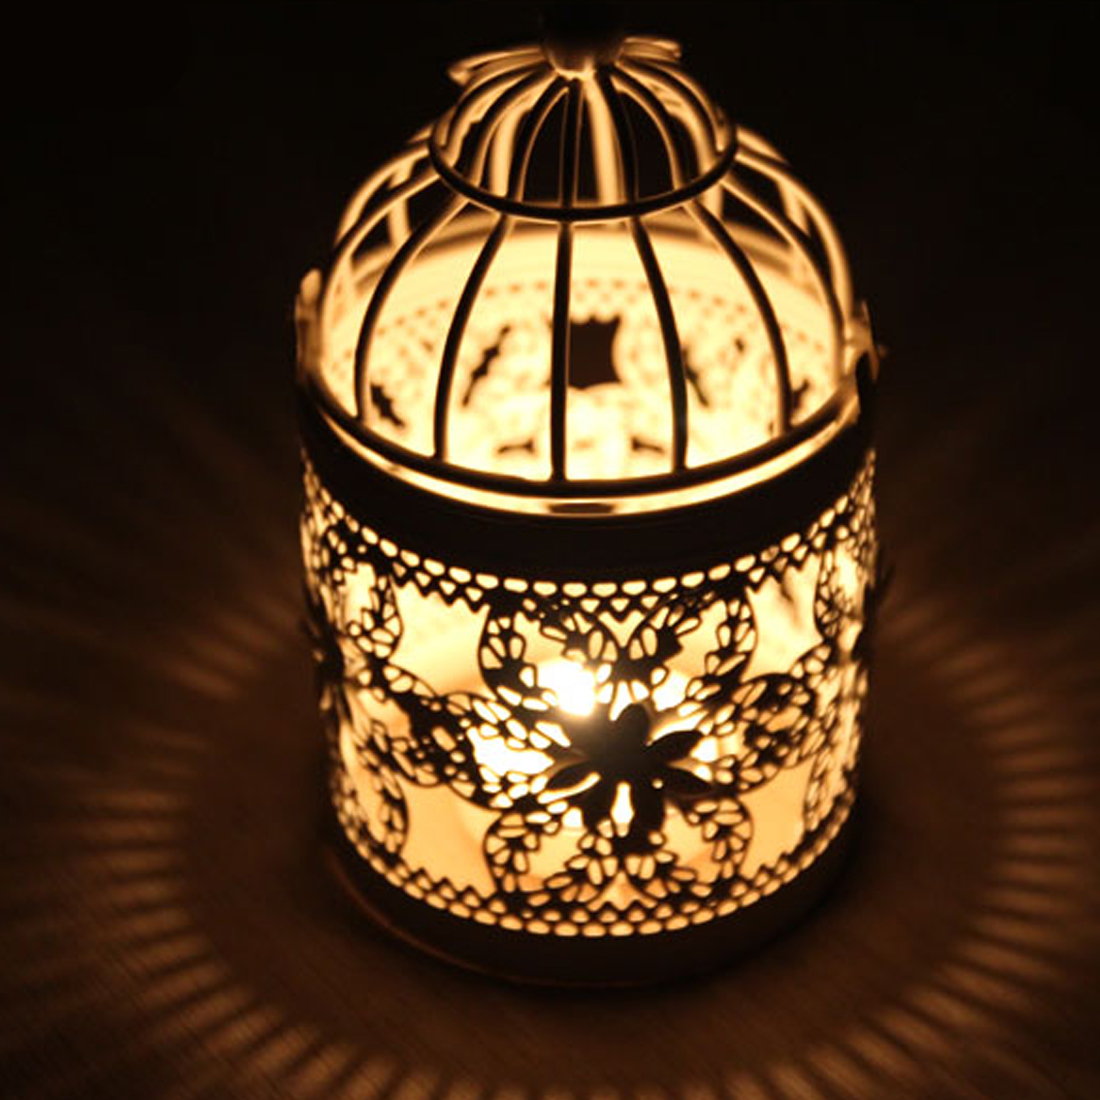 Candles & Holders Home & Garden European Style Metal Candle Holder White Candlestic Moroccan Lamp Metal Lantern Wedding Decoration Portavelas Candlestick Jkl071 Wide Varieties